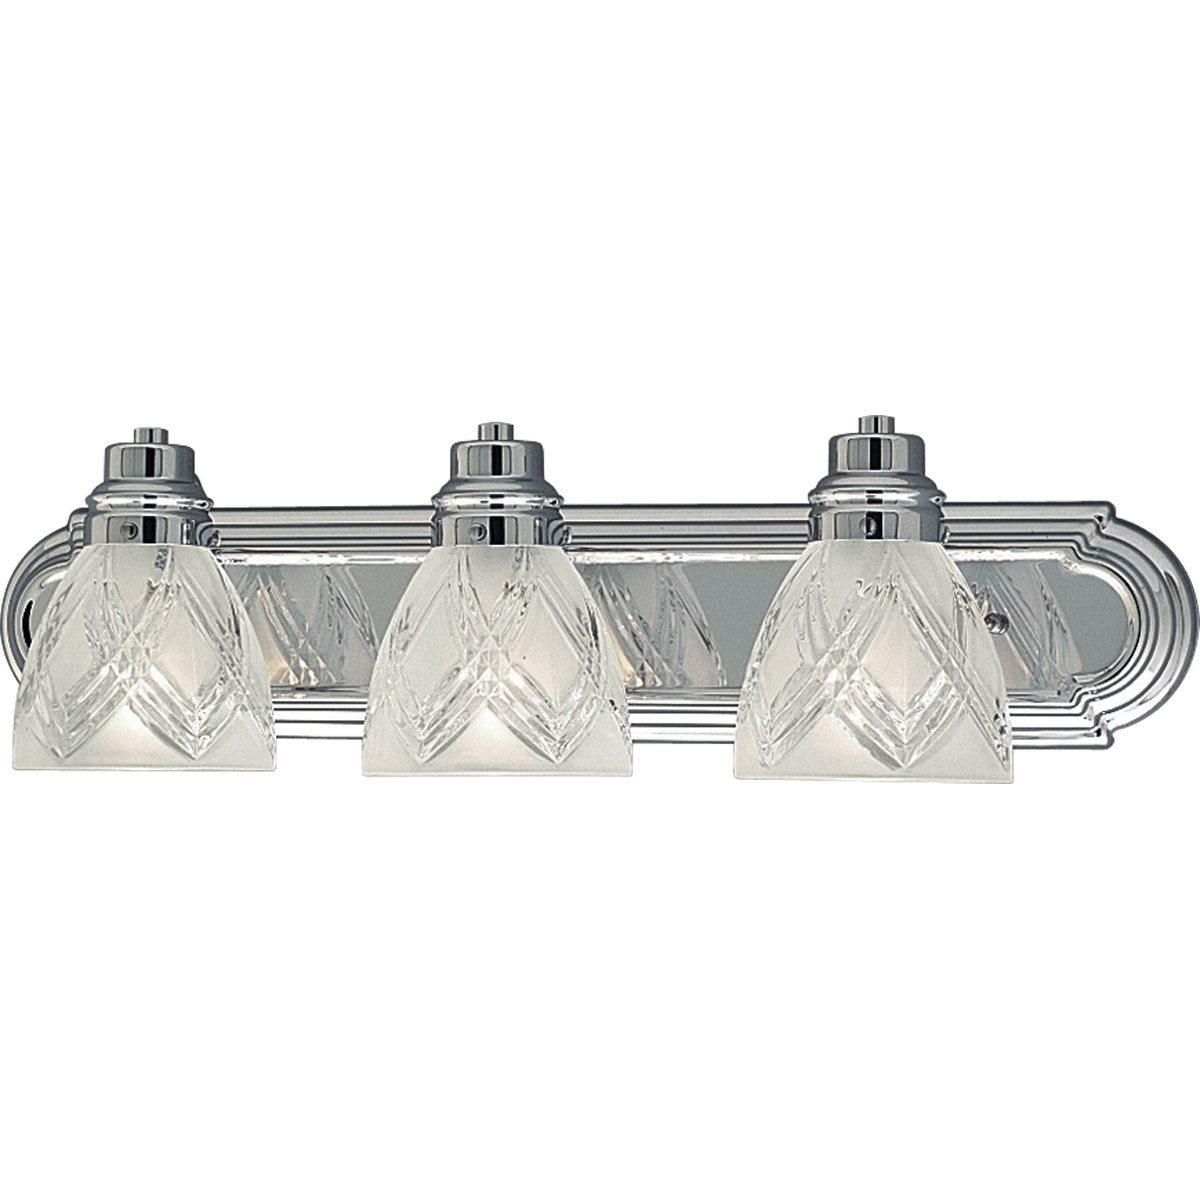 Progress lighting p3044 15 crystal cut transitional for Crystal lighting for bathroom